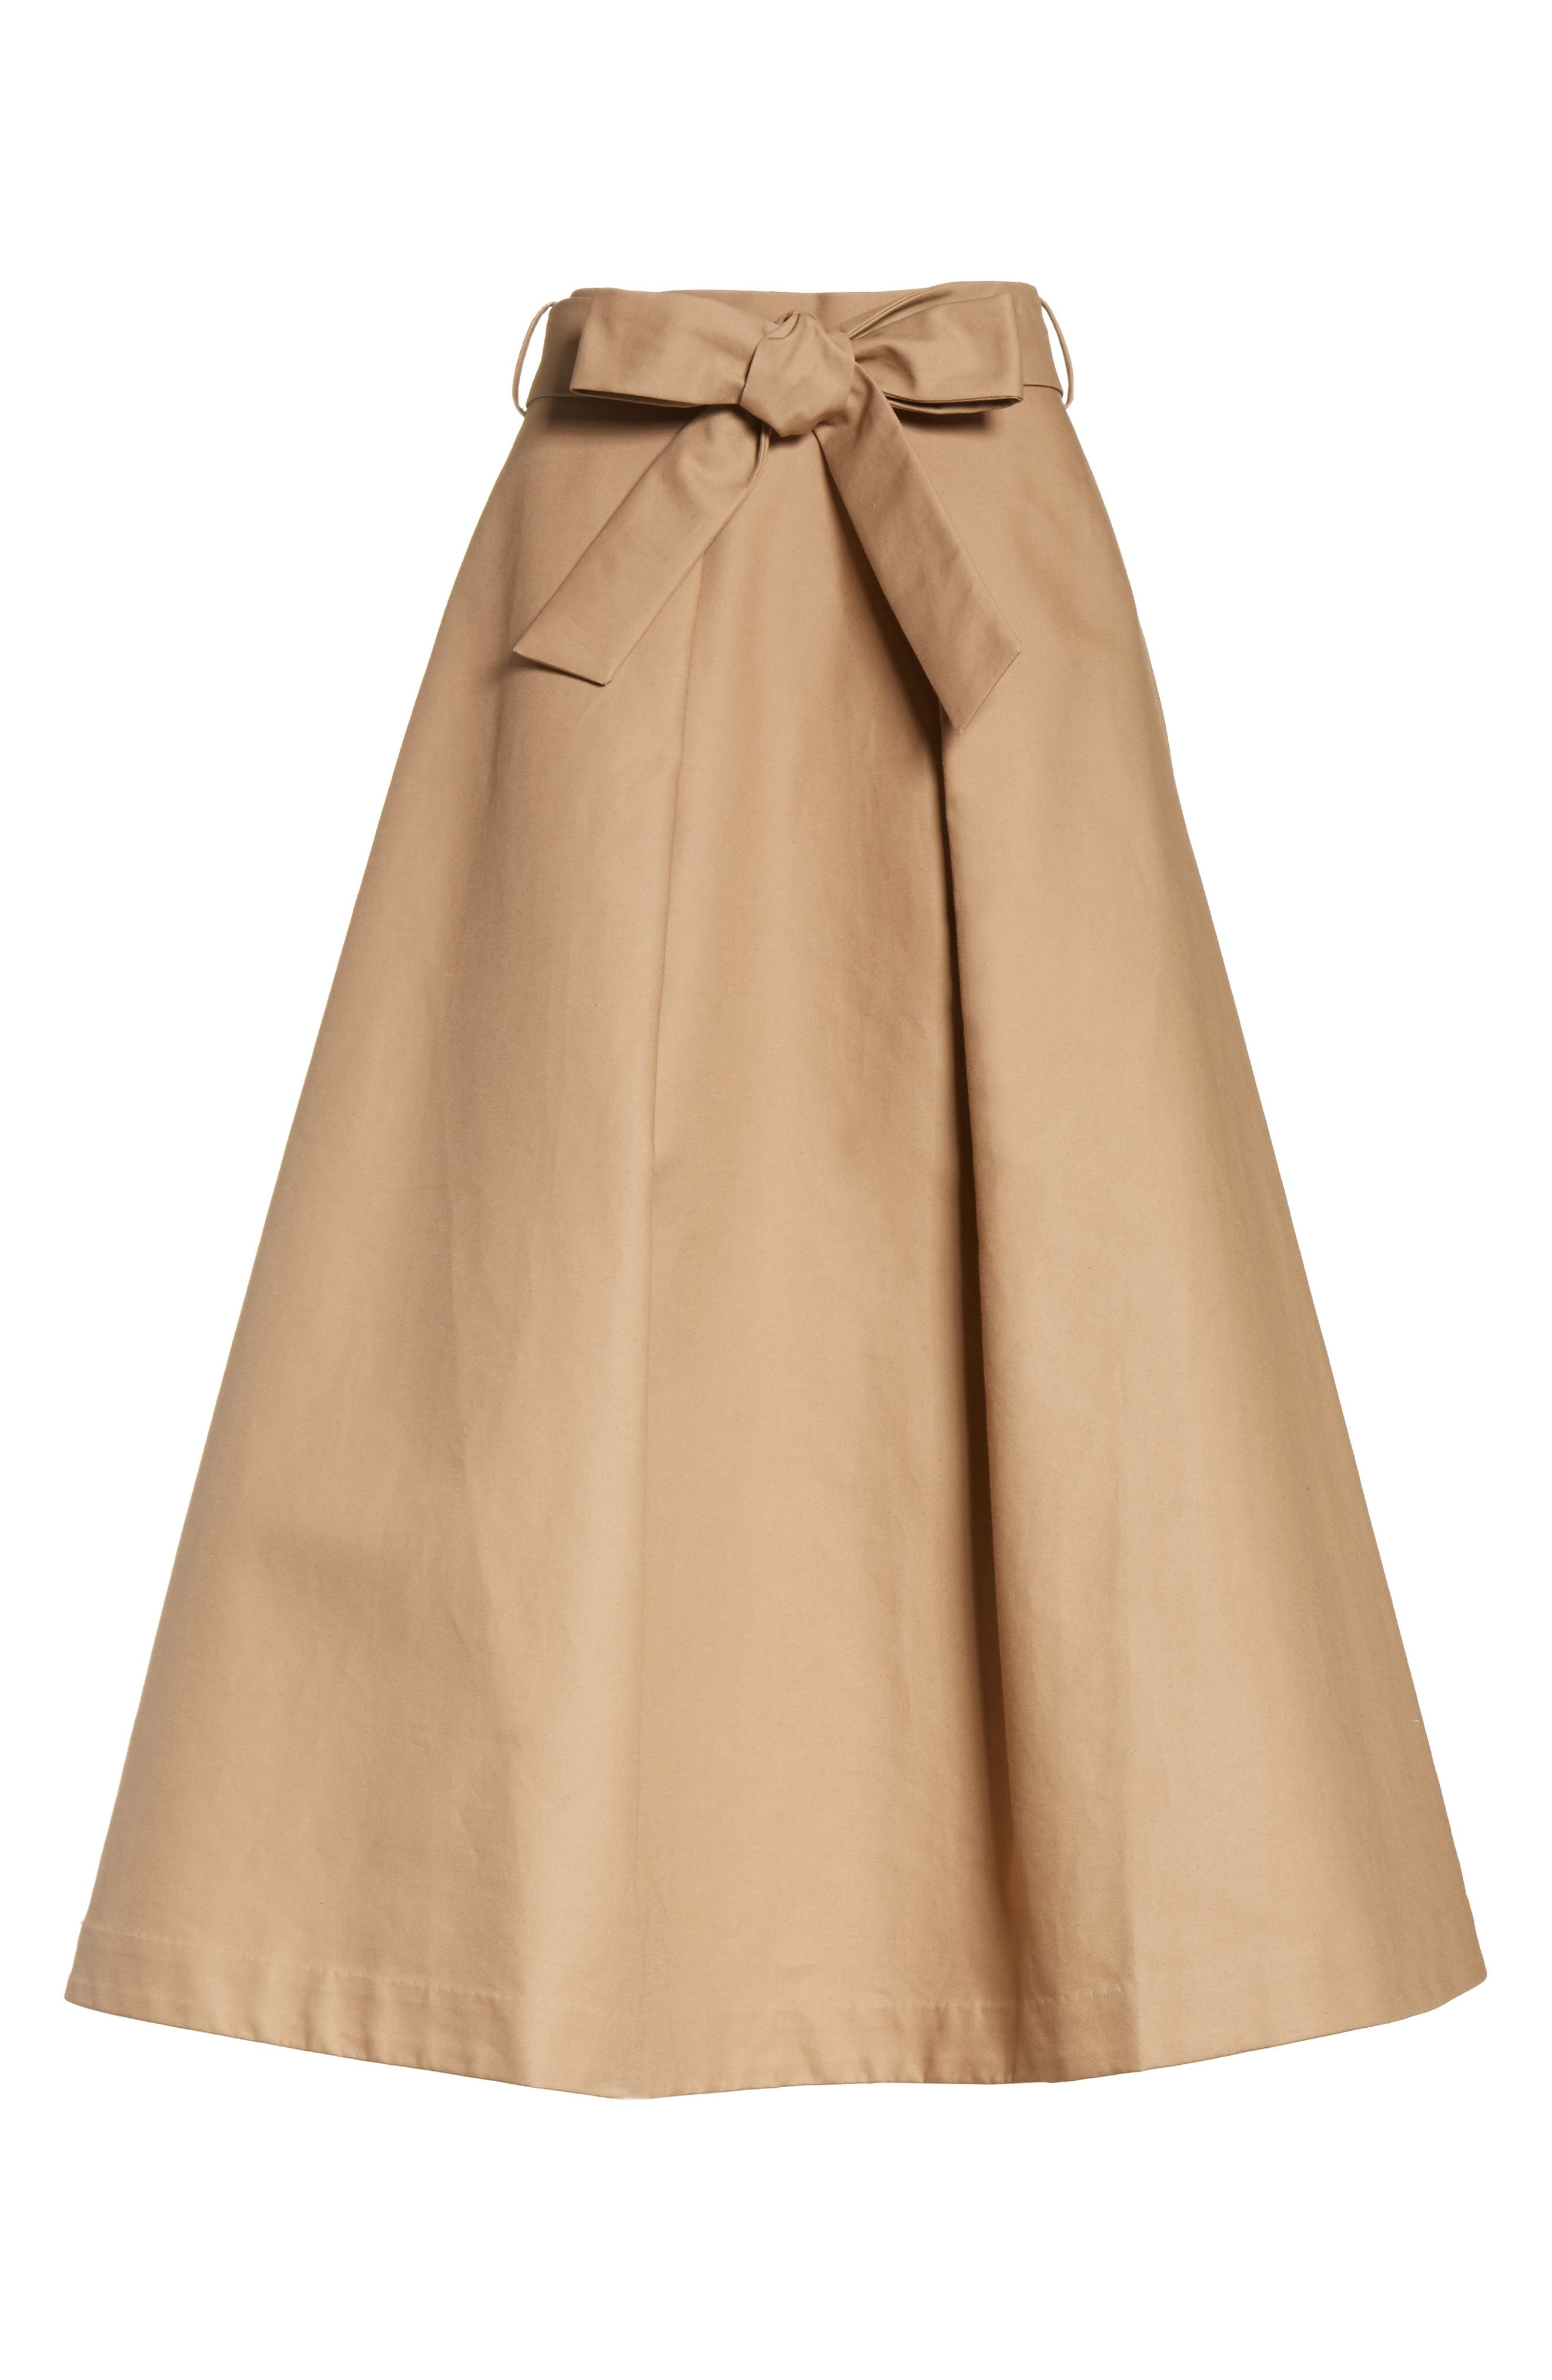 Belted Cotton Skirt,                             Alternate thumbnail 6, color,                             240